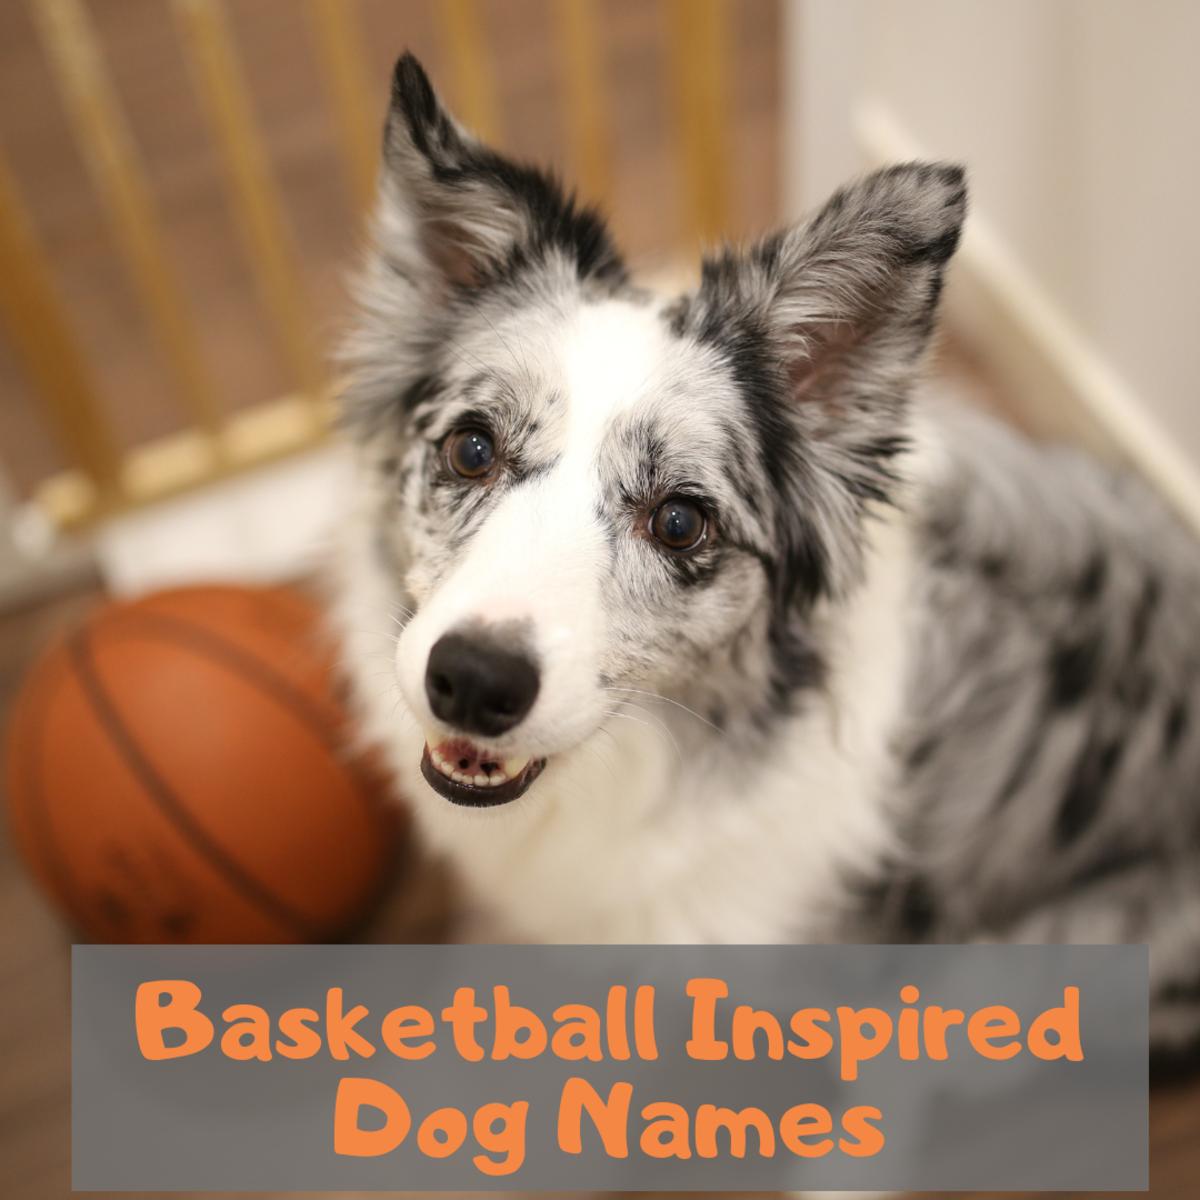 Dog names for basketball fans.